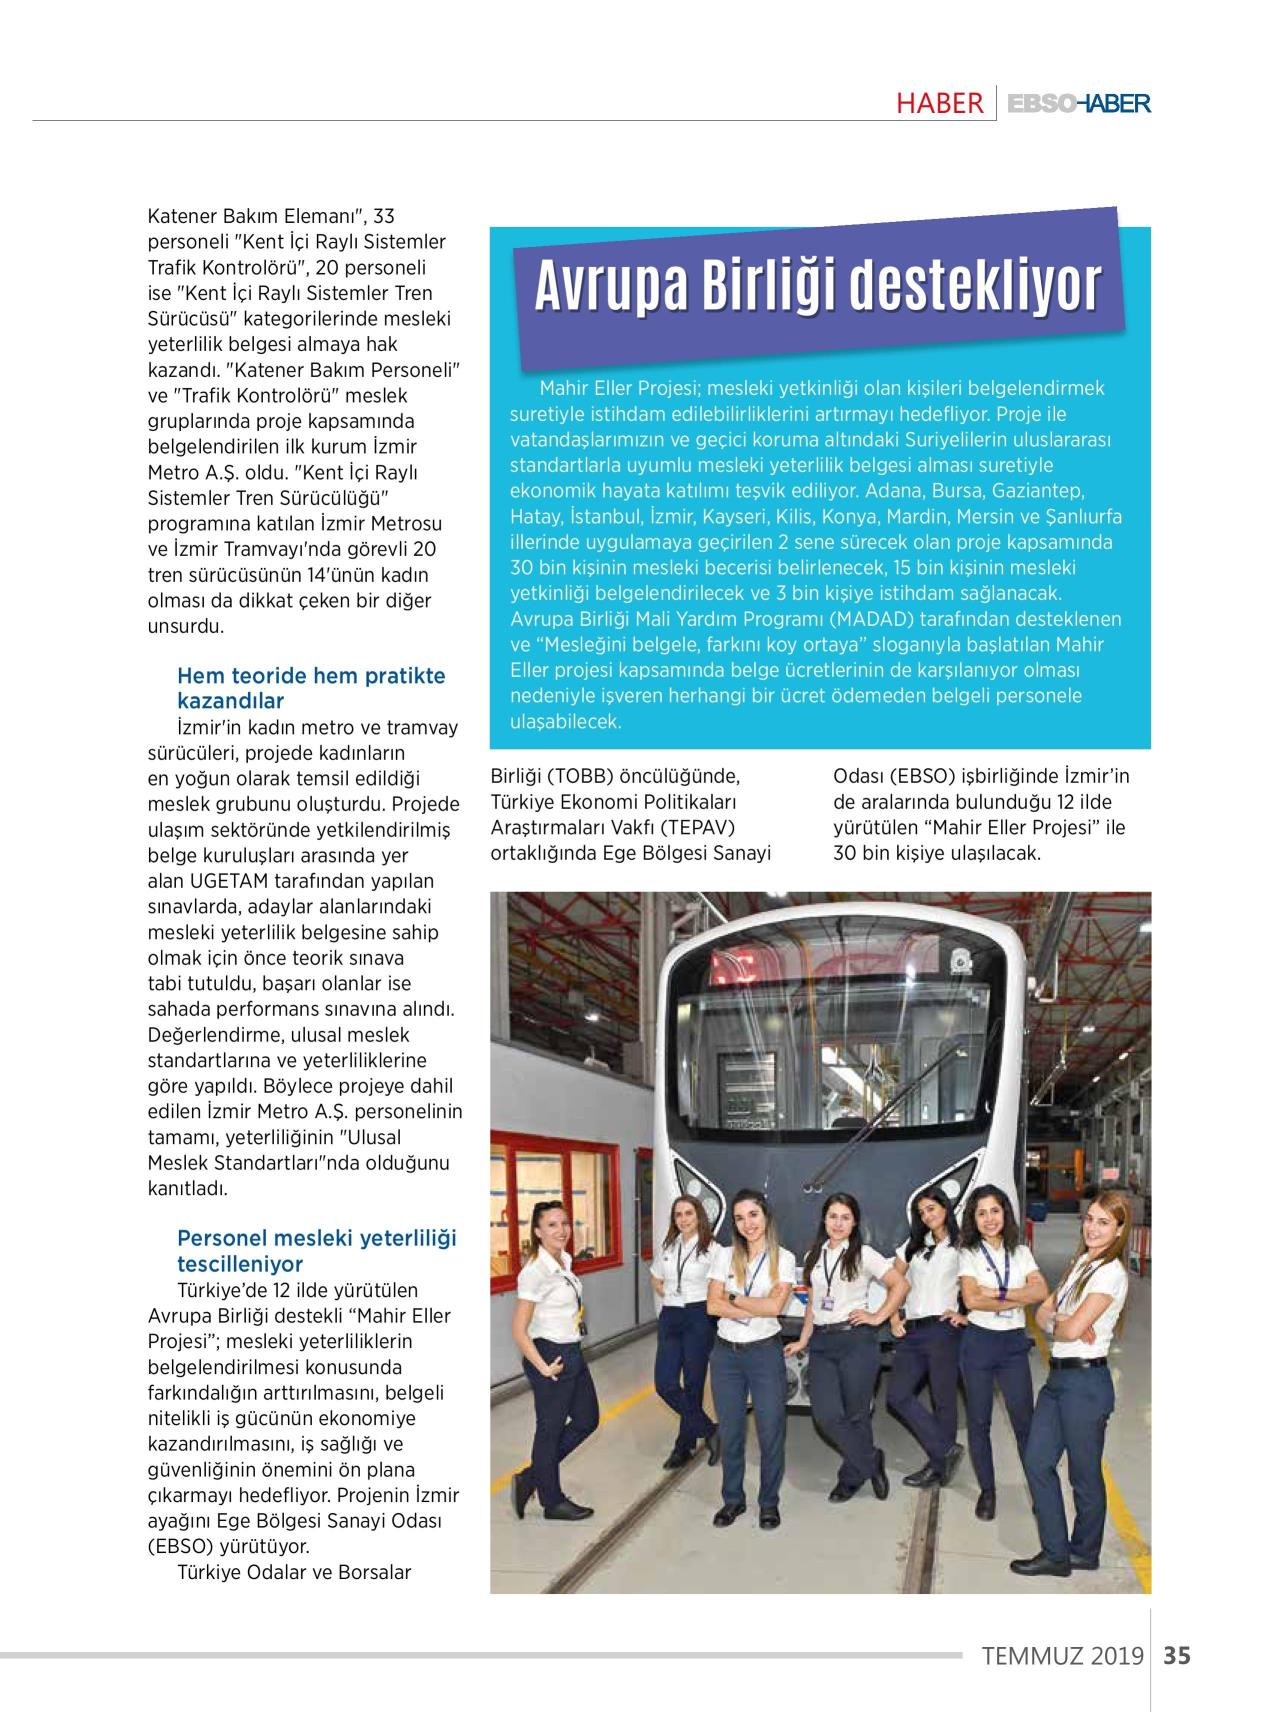 İzmir Metrosu Mahir Eller